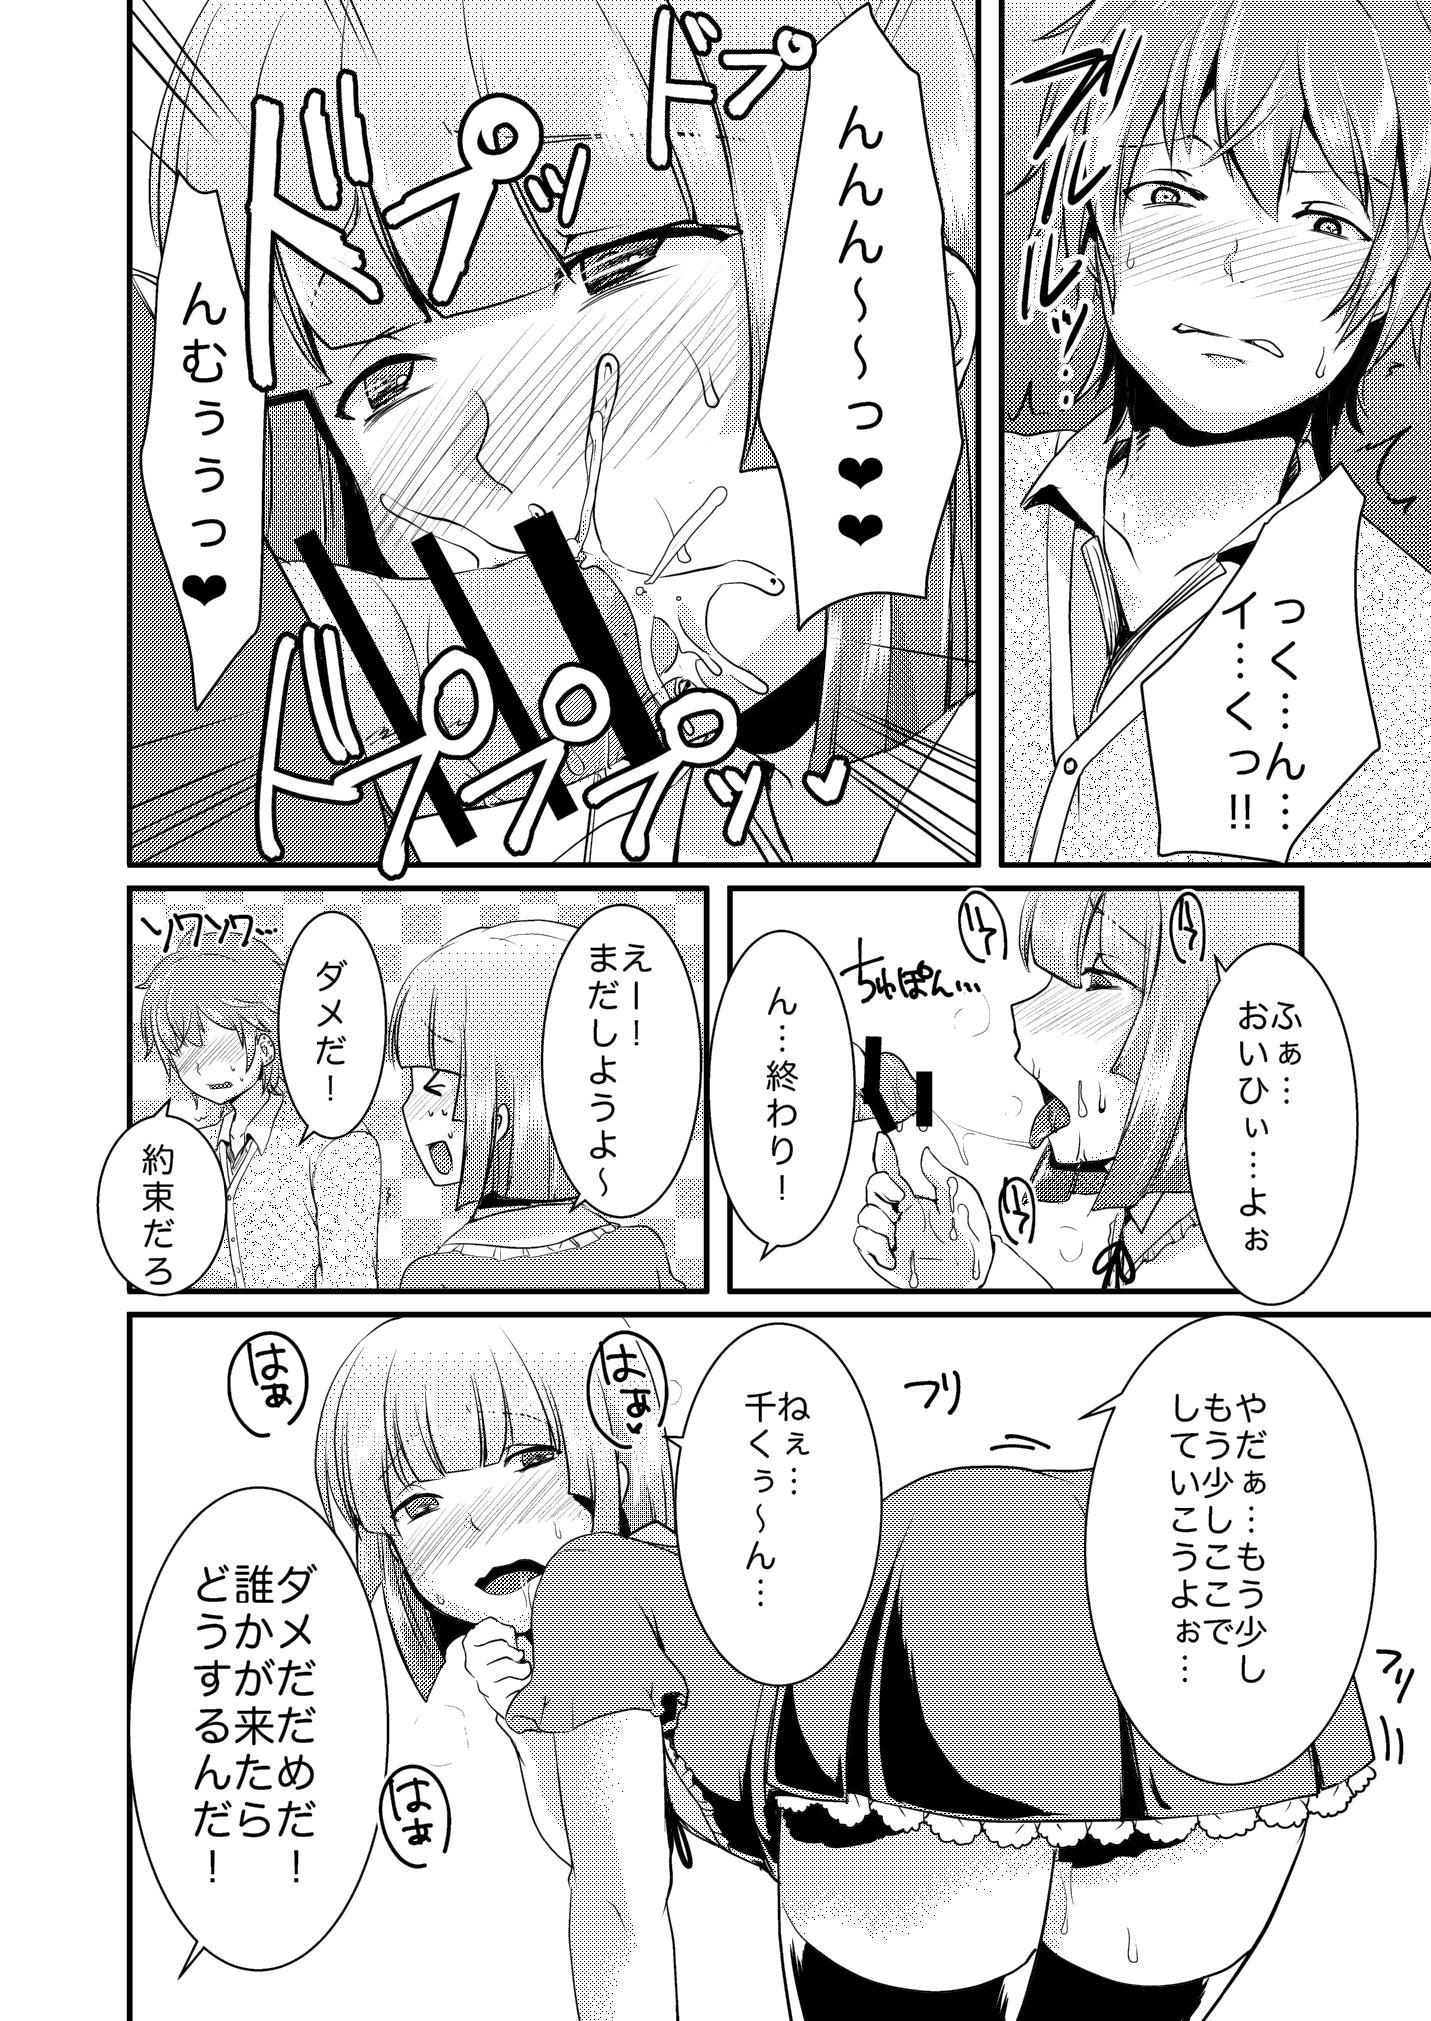 [ManbooRerere] Ore no Koibito (♂) ga Hentai Sugite… 4